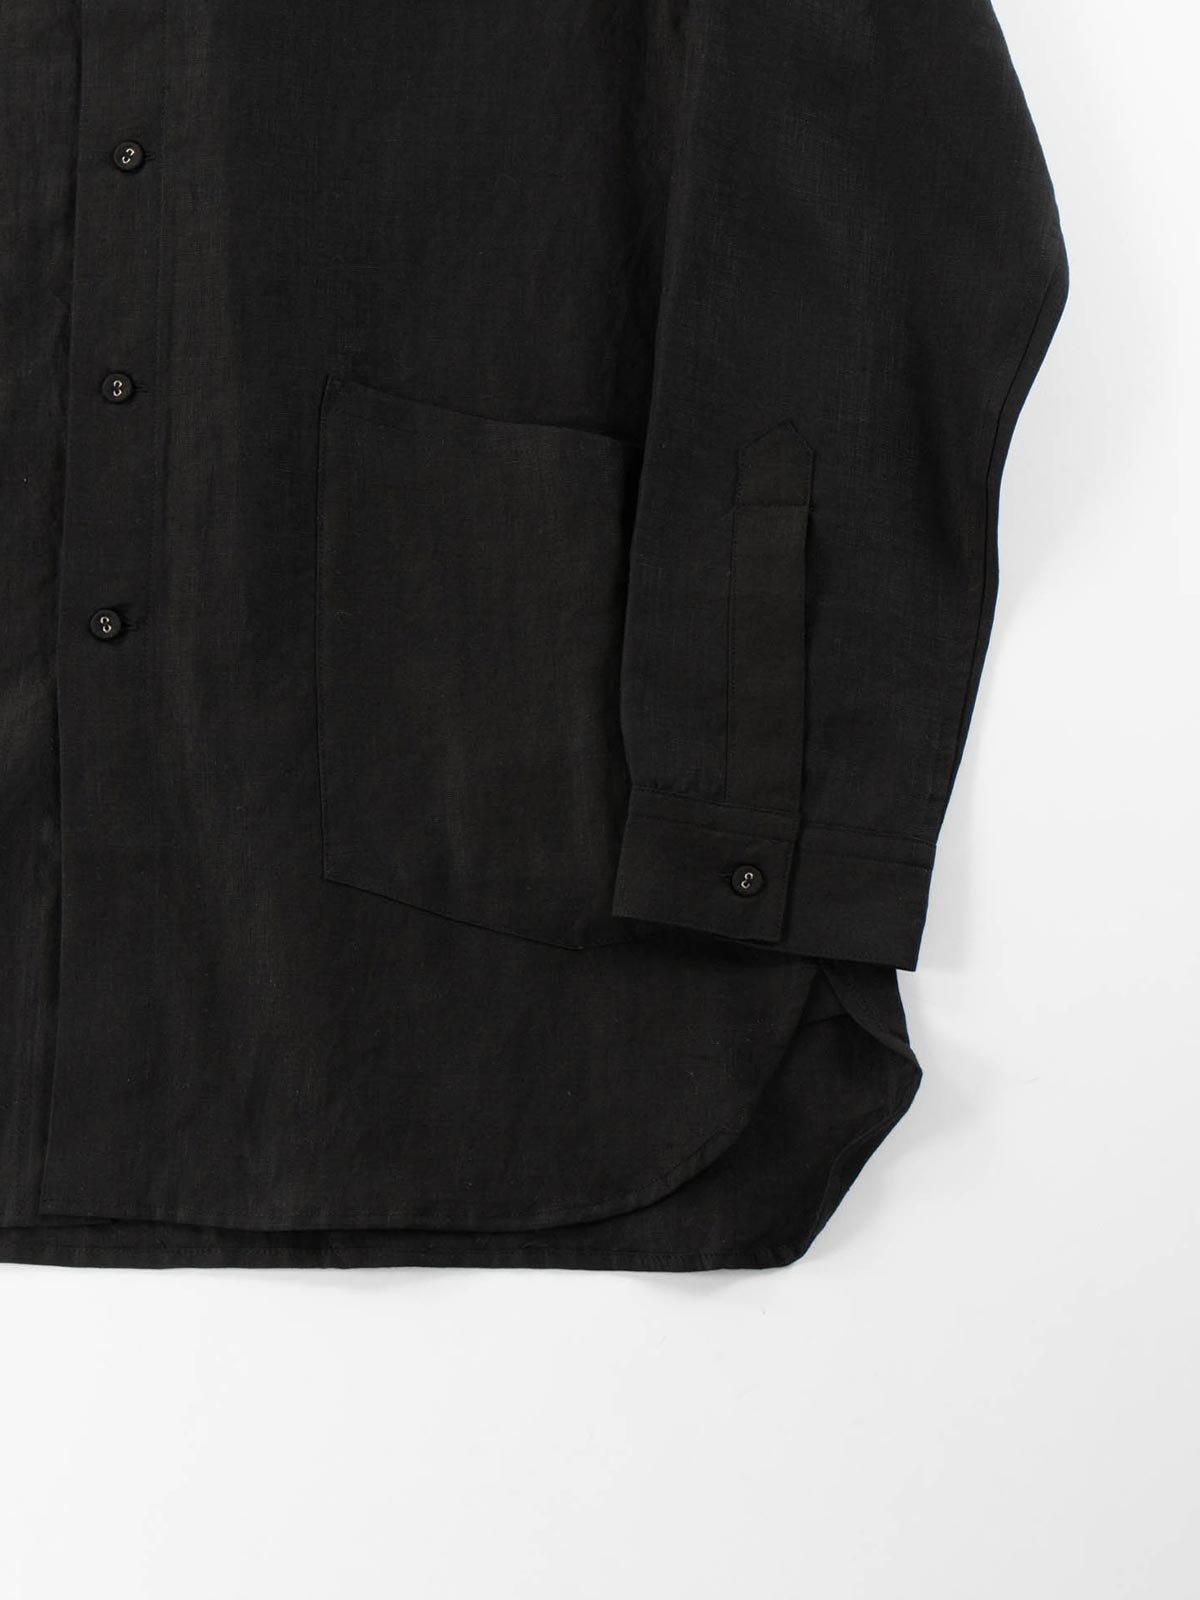 LINEN GARDNER SHIRT BLACK - Image 4